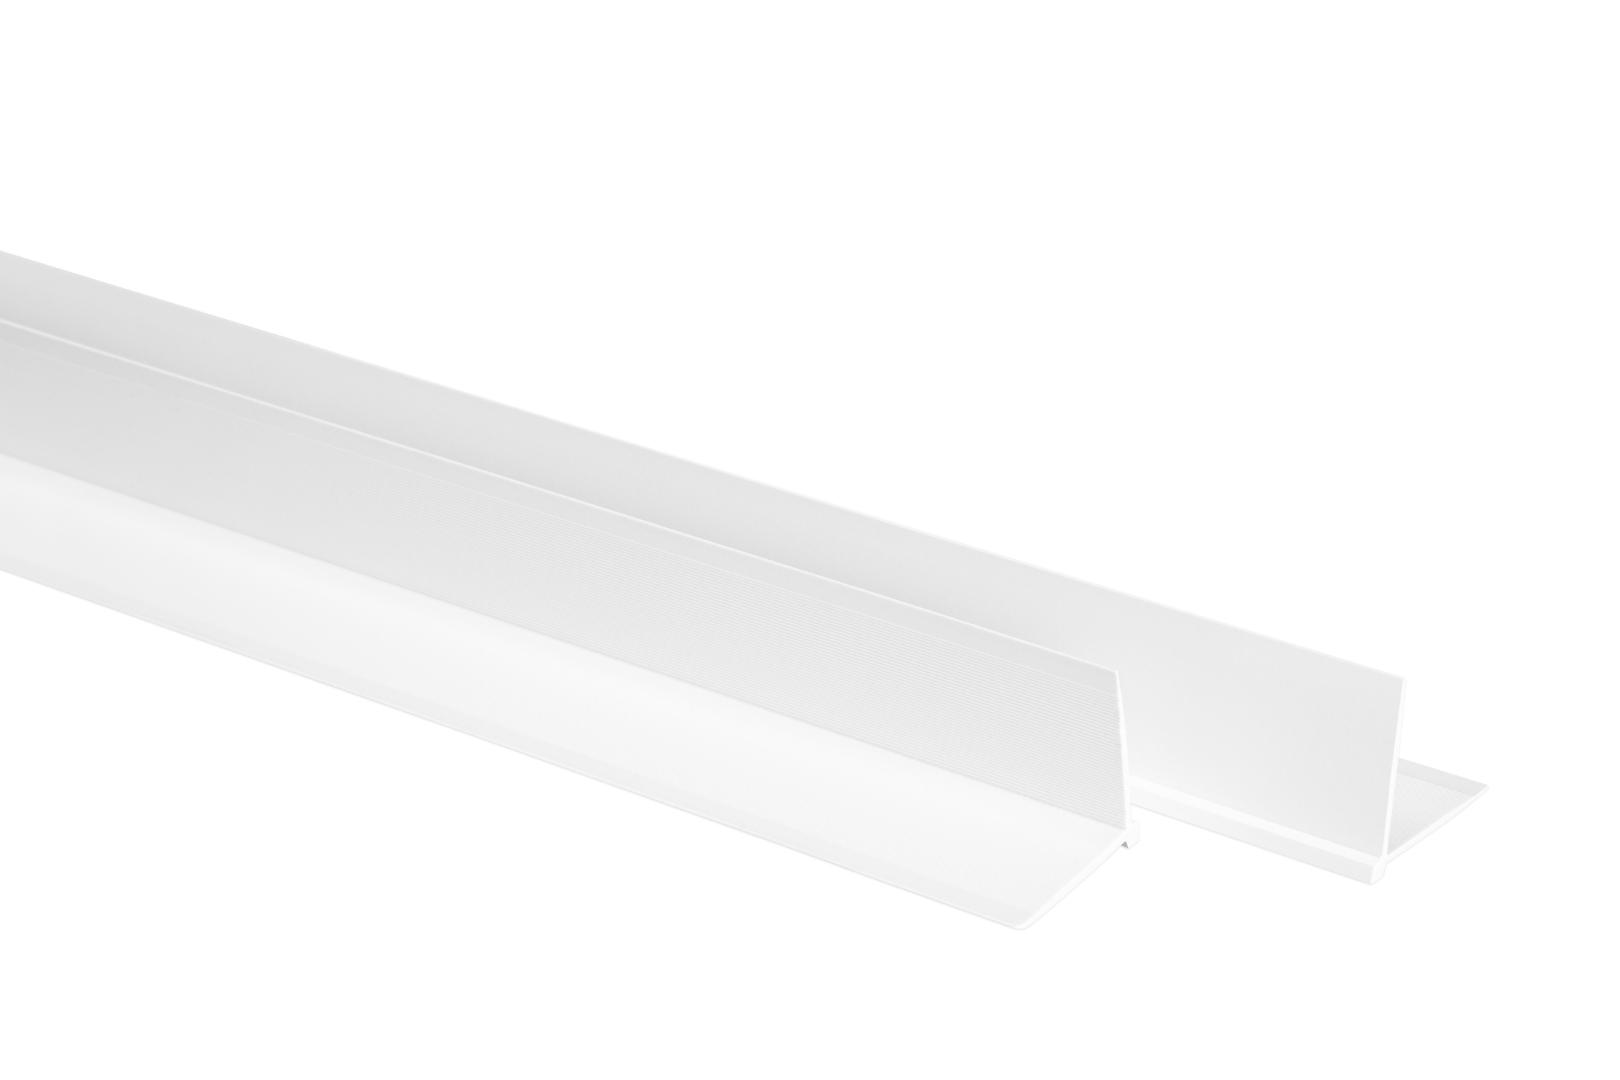 LEMAL Tapeteneckleisten 2 Meter - Maler Eckenwinkel Kantenschutzprofil weiß 23x23mm TE0101